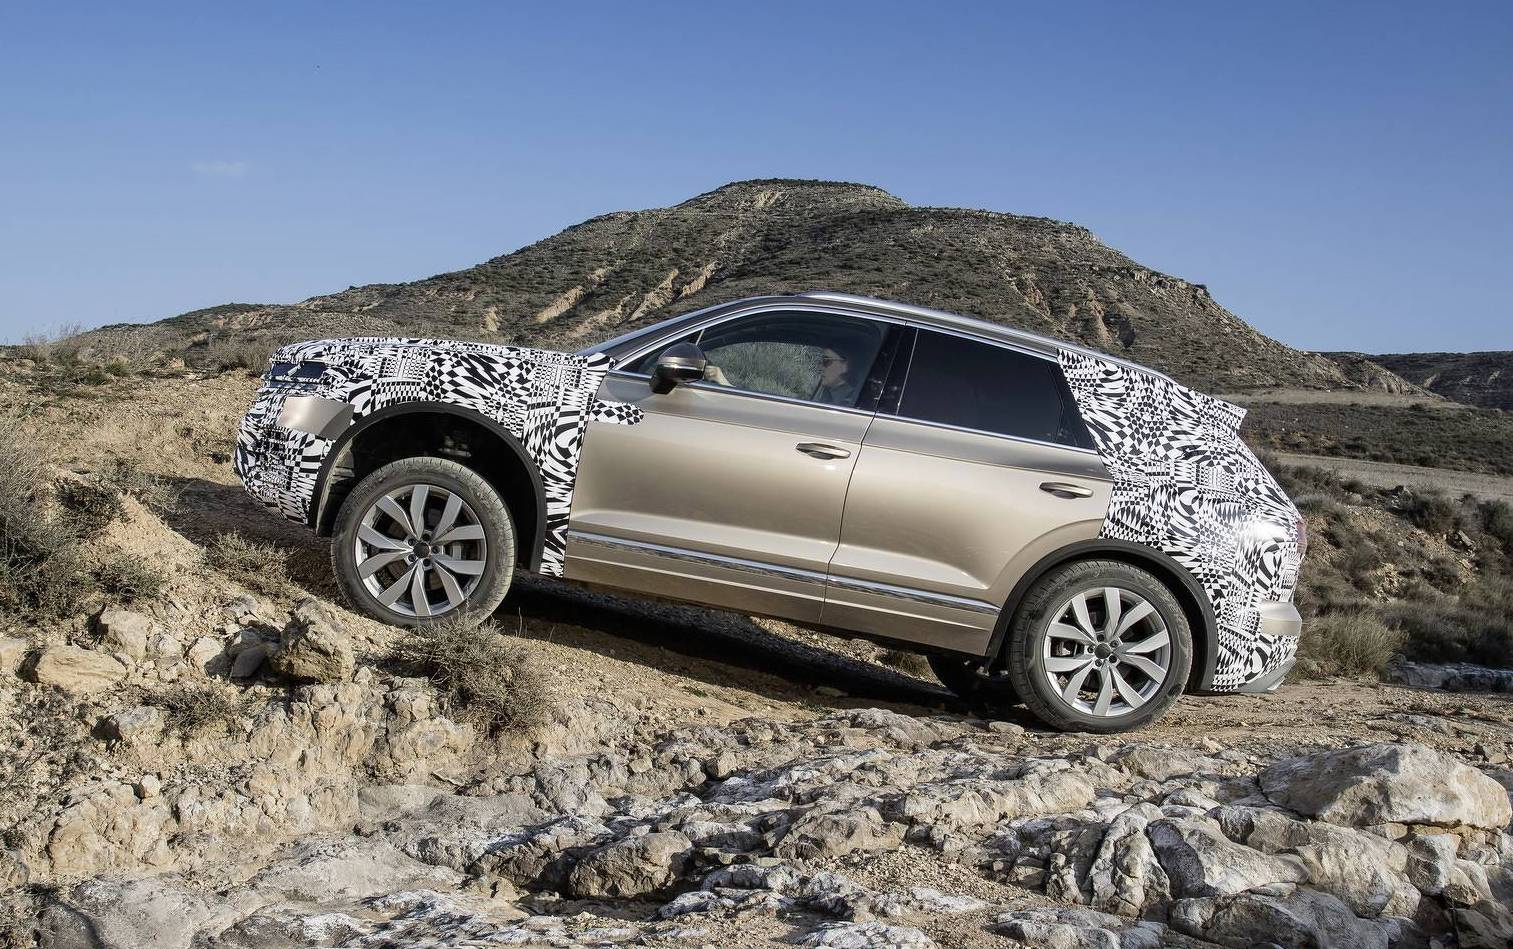 2019 Volkswagen Touareg Previewed Interior Revealed